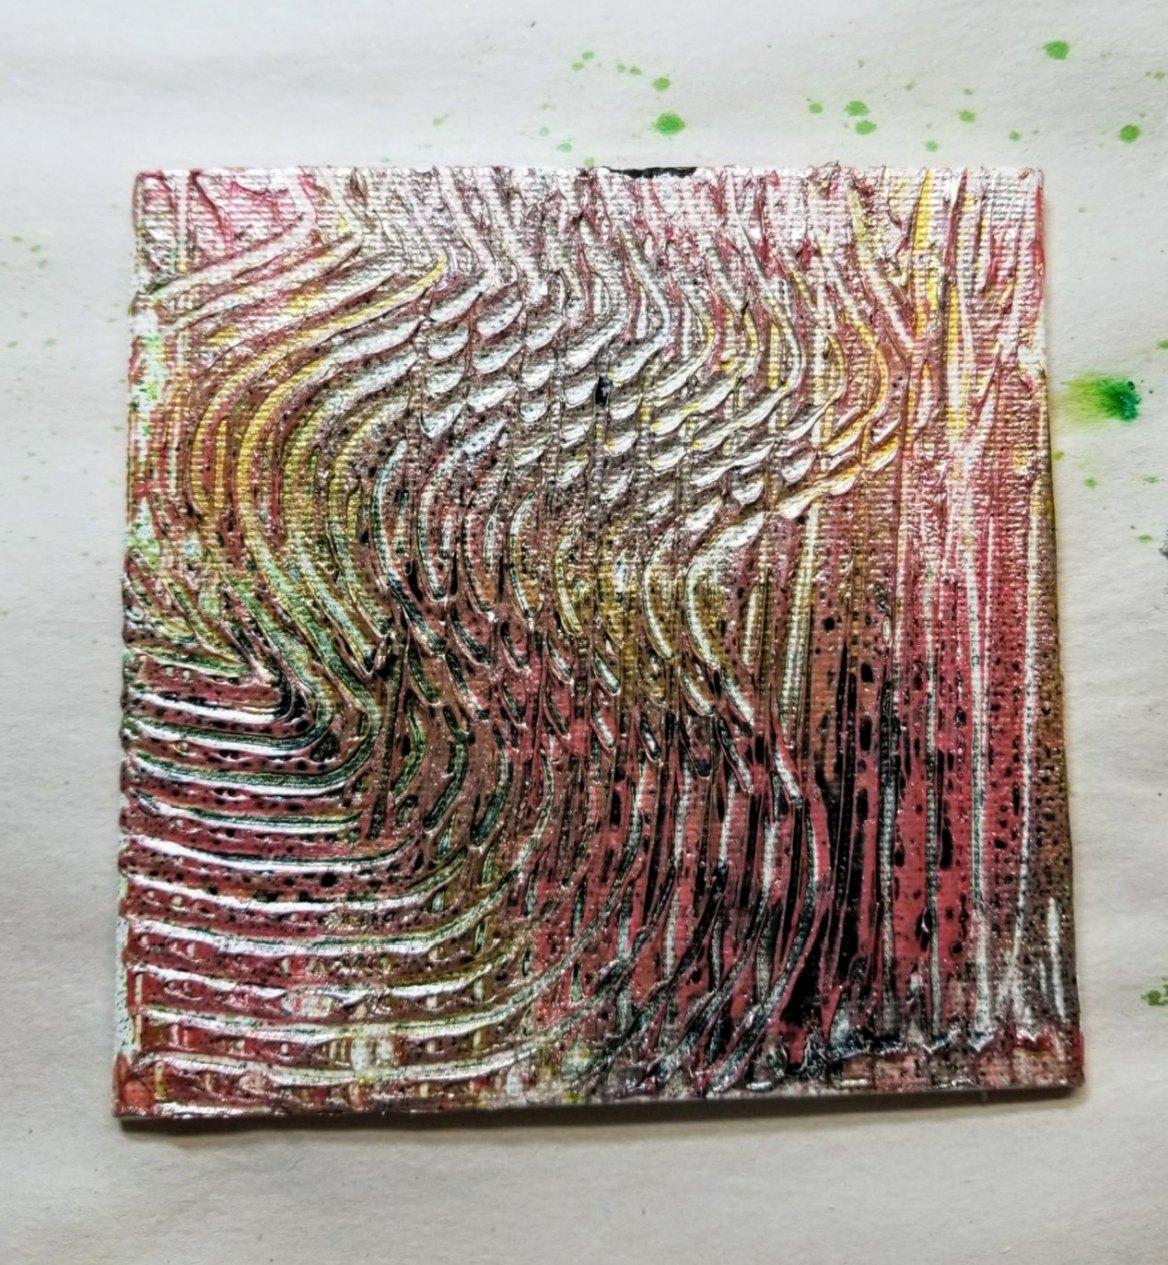 12. Acrylic paint w/ comb